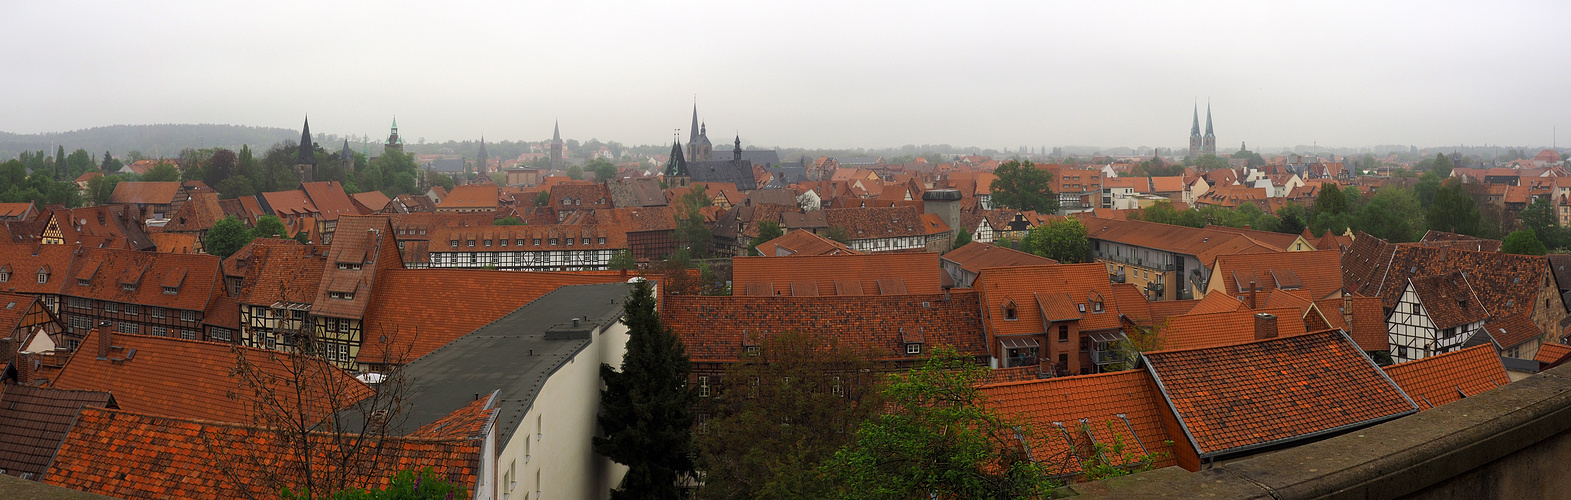 Pano vom Schlossberg